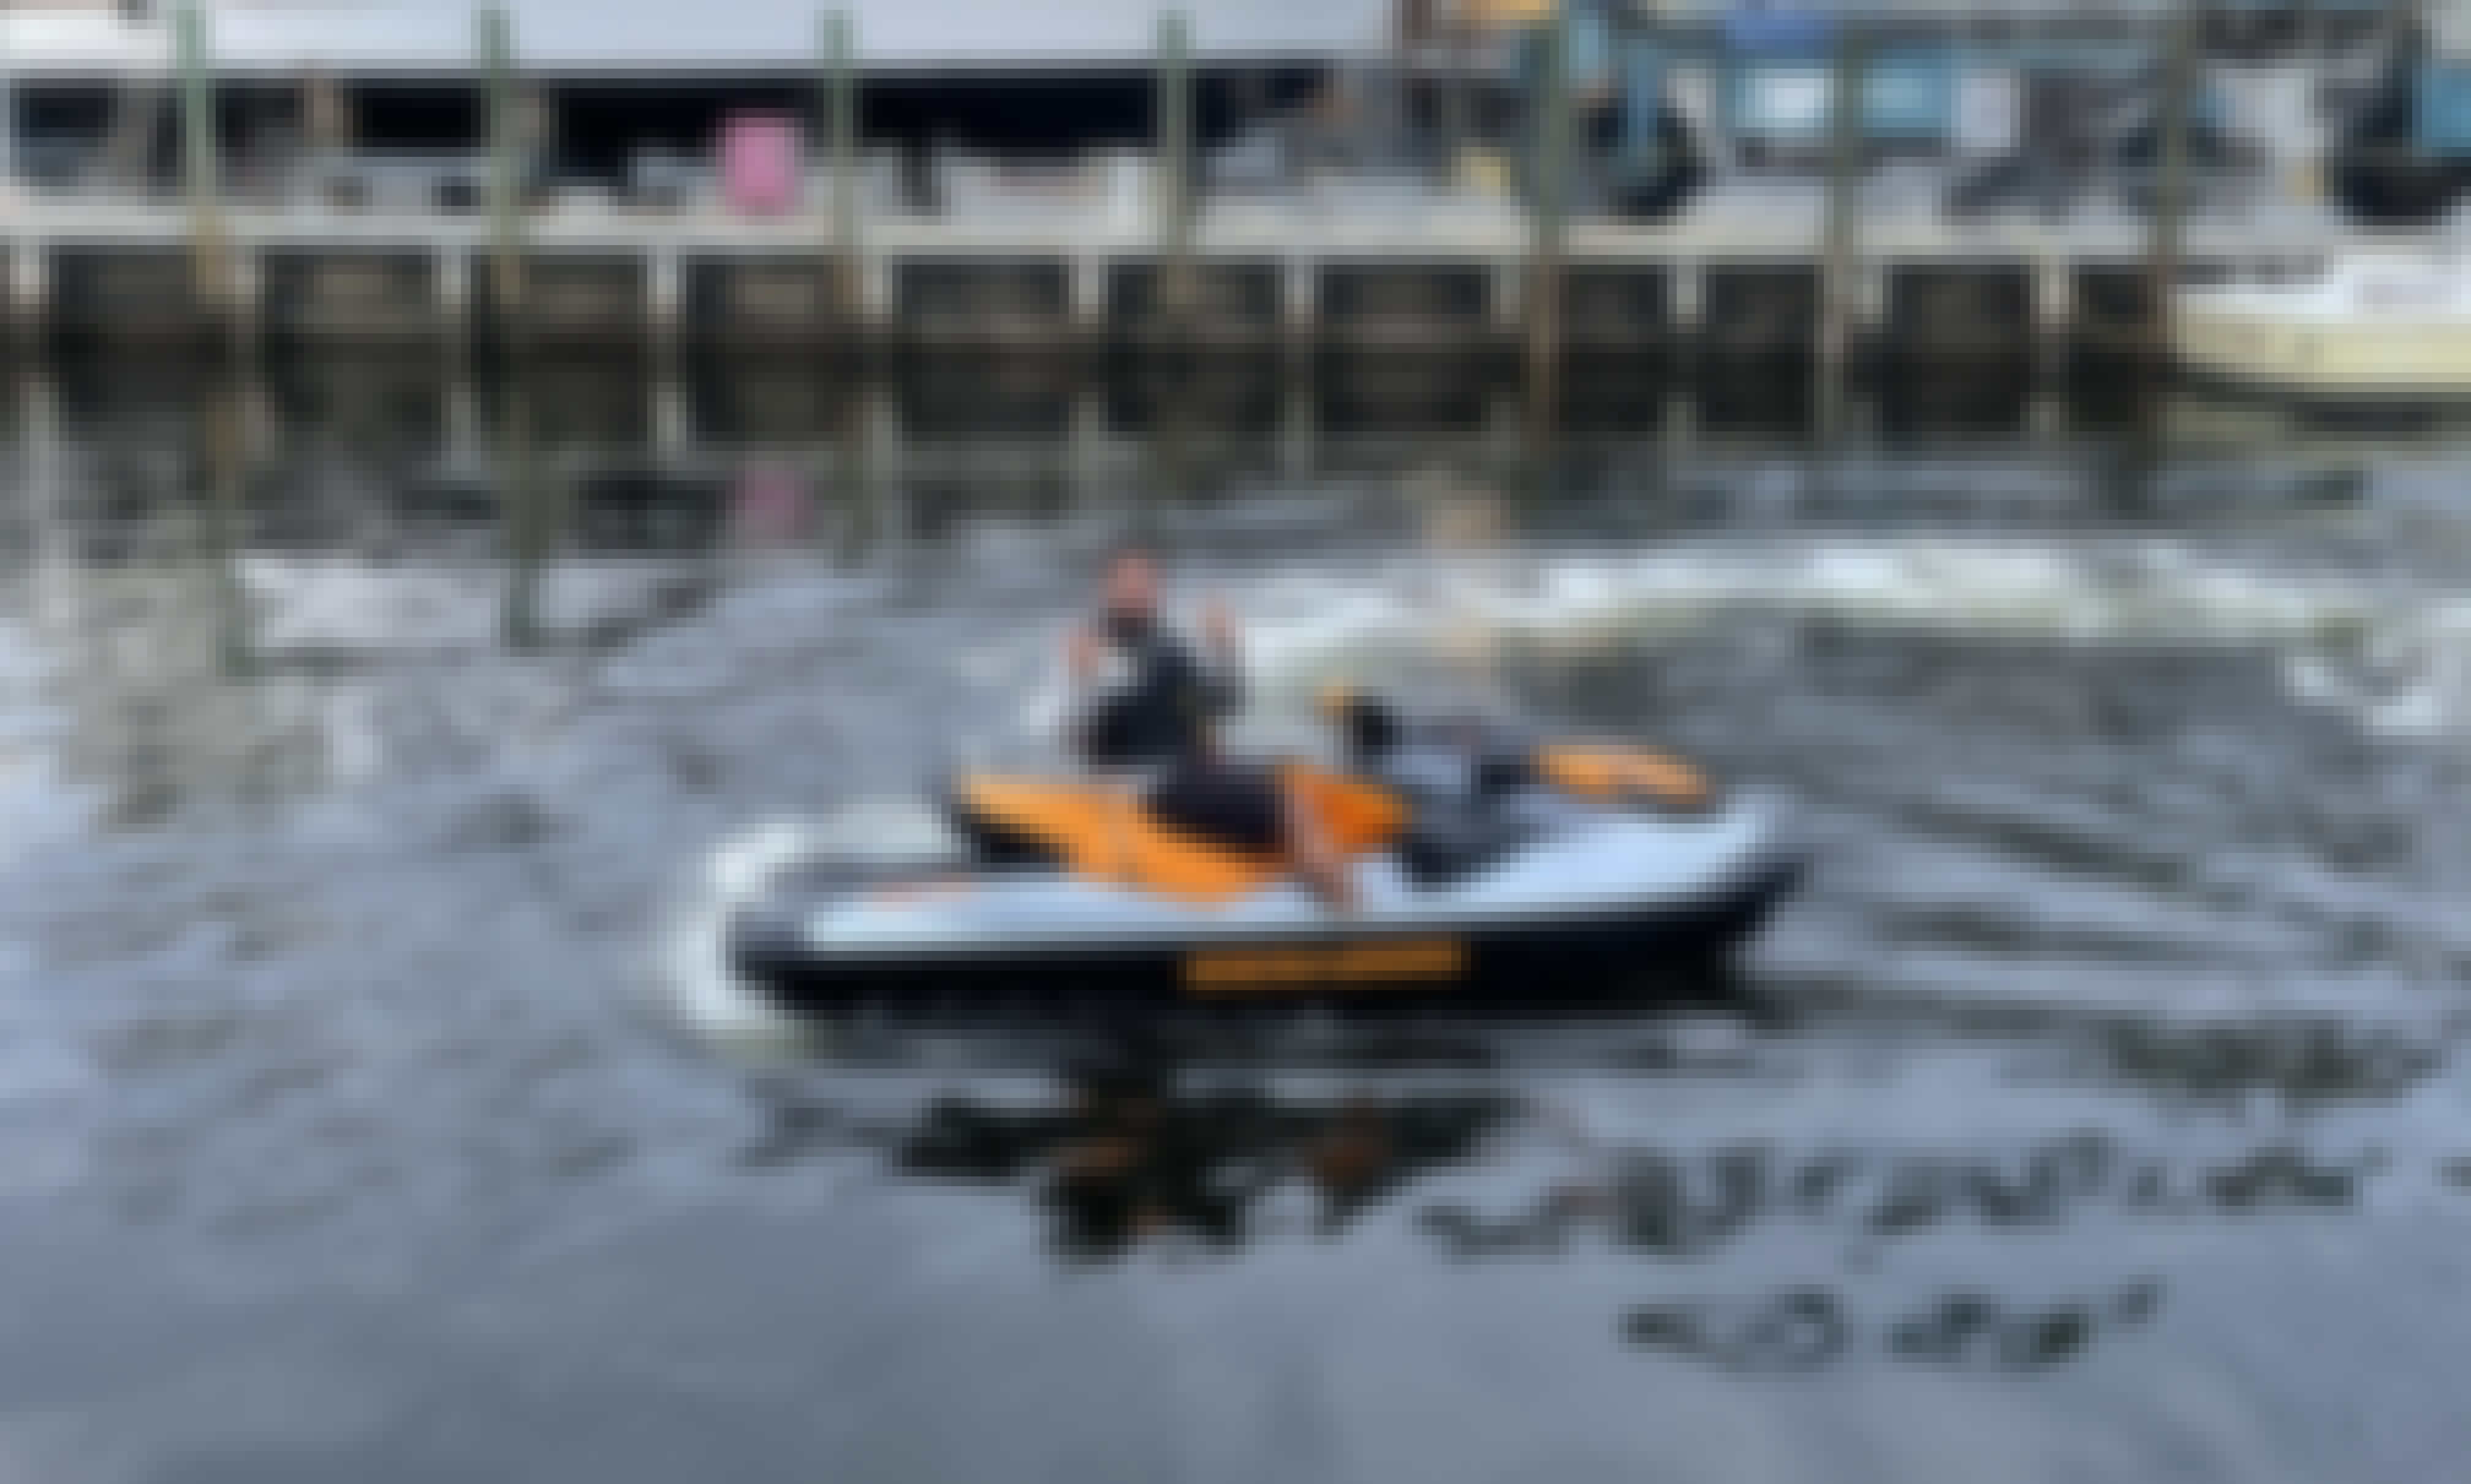 Limitless Watersports - Sea-Doo Jet Ski Rental (ft. powerful bluetooth speakers)